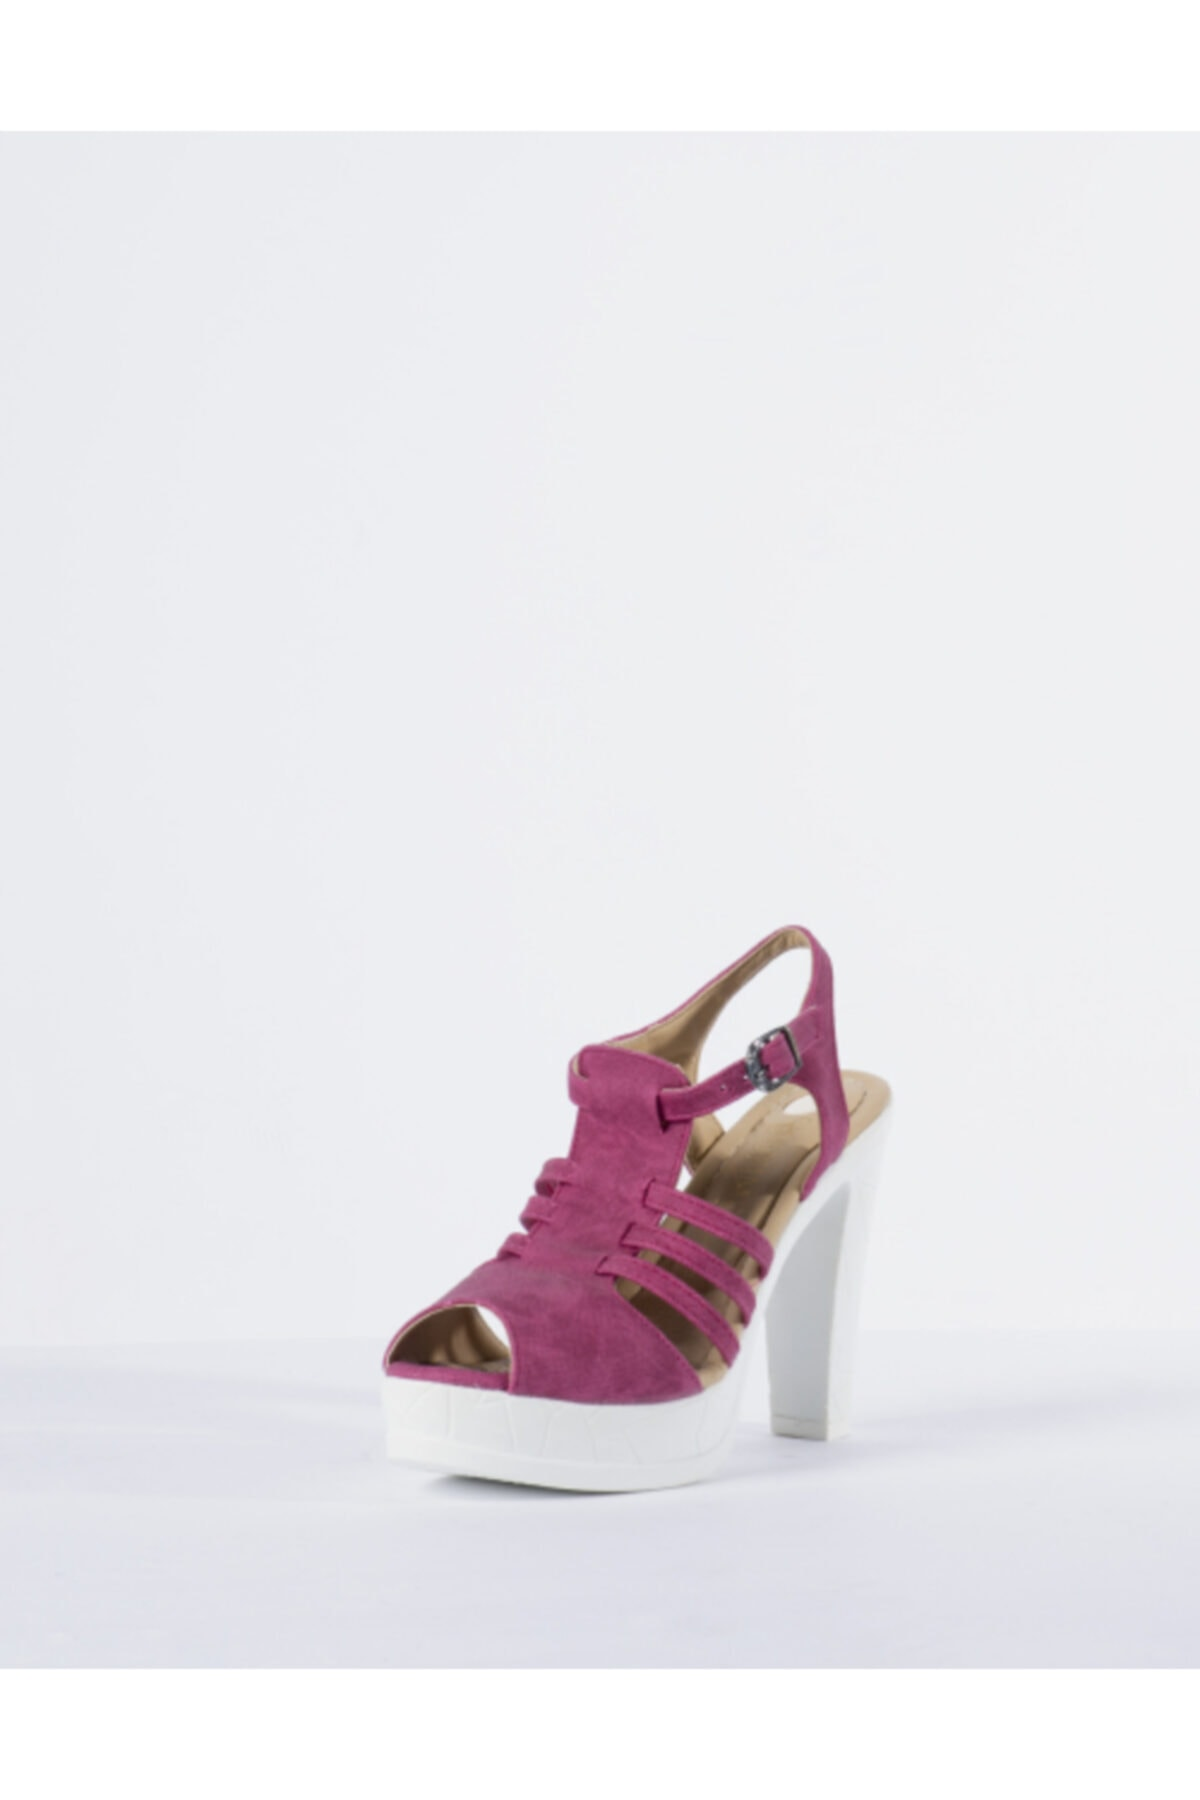 Vision Kadın Pembe Topuklu Ayakkabı 2